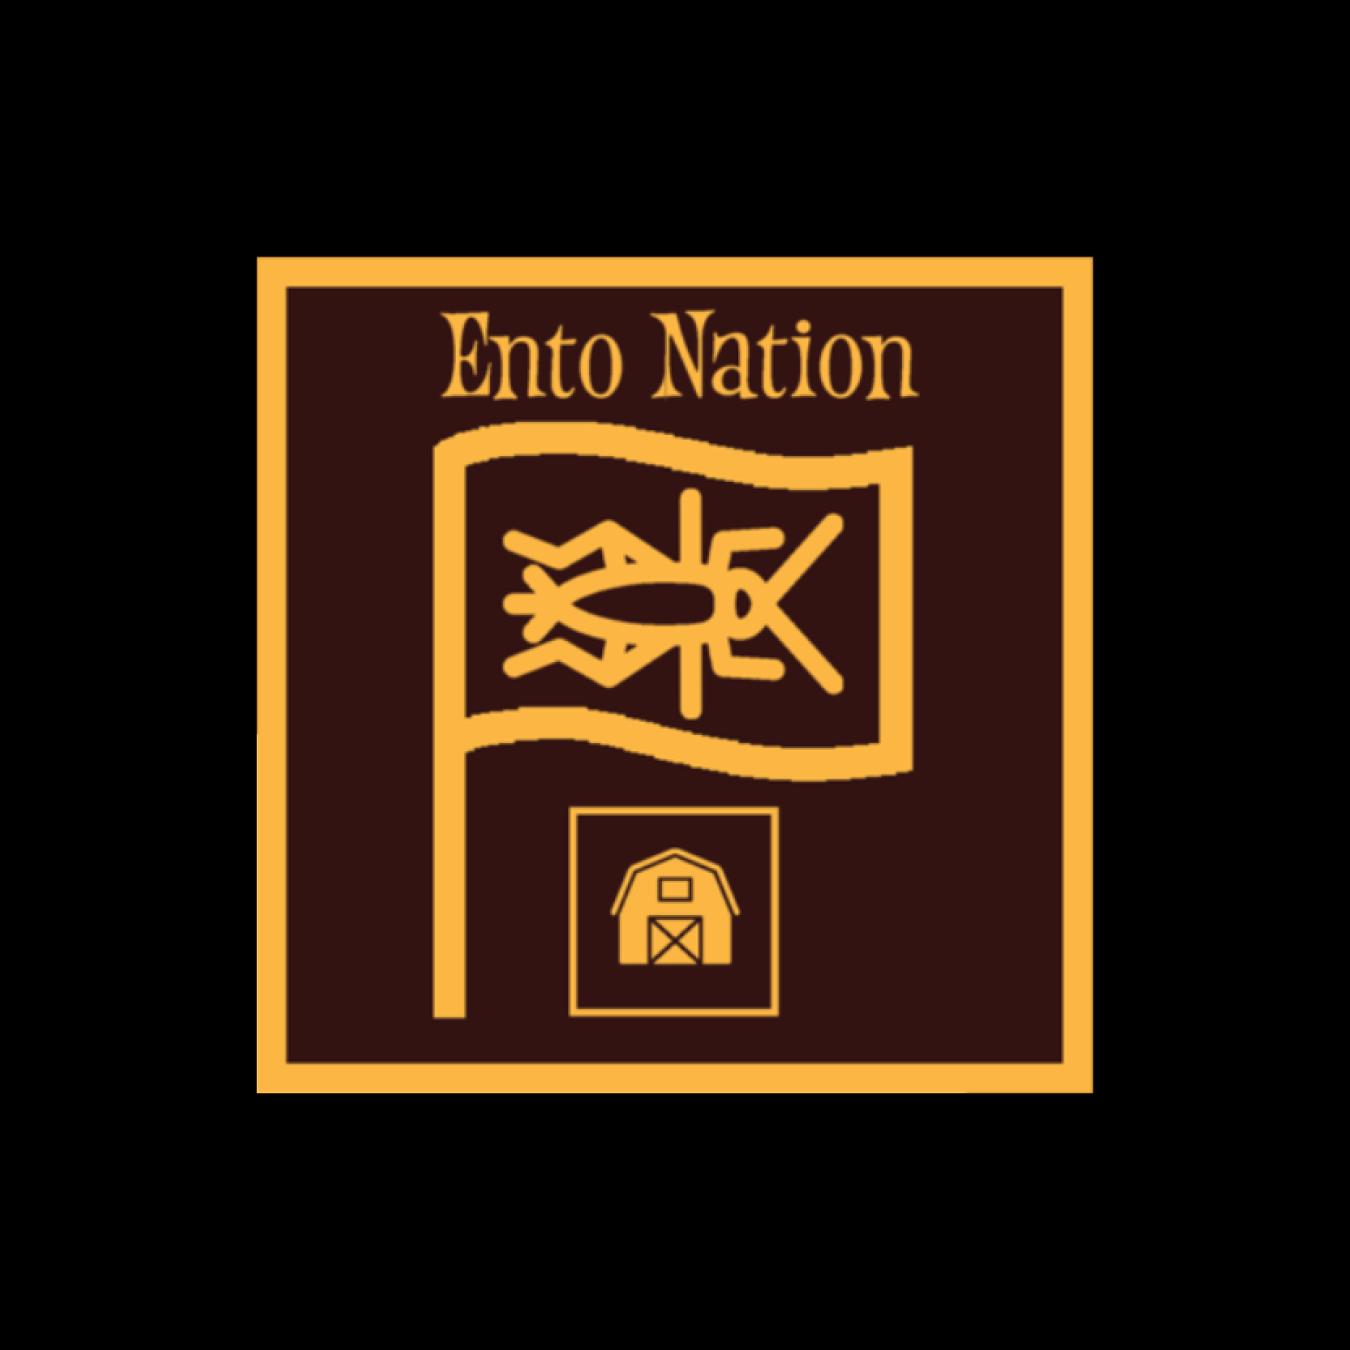 entonation.png